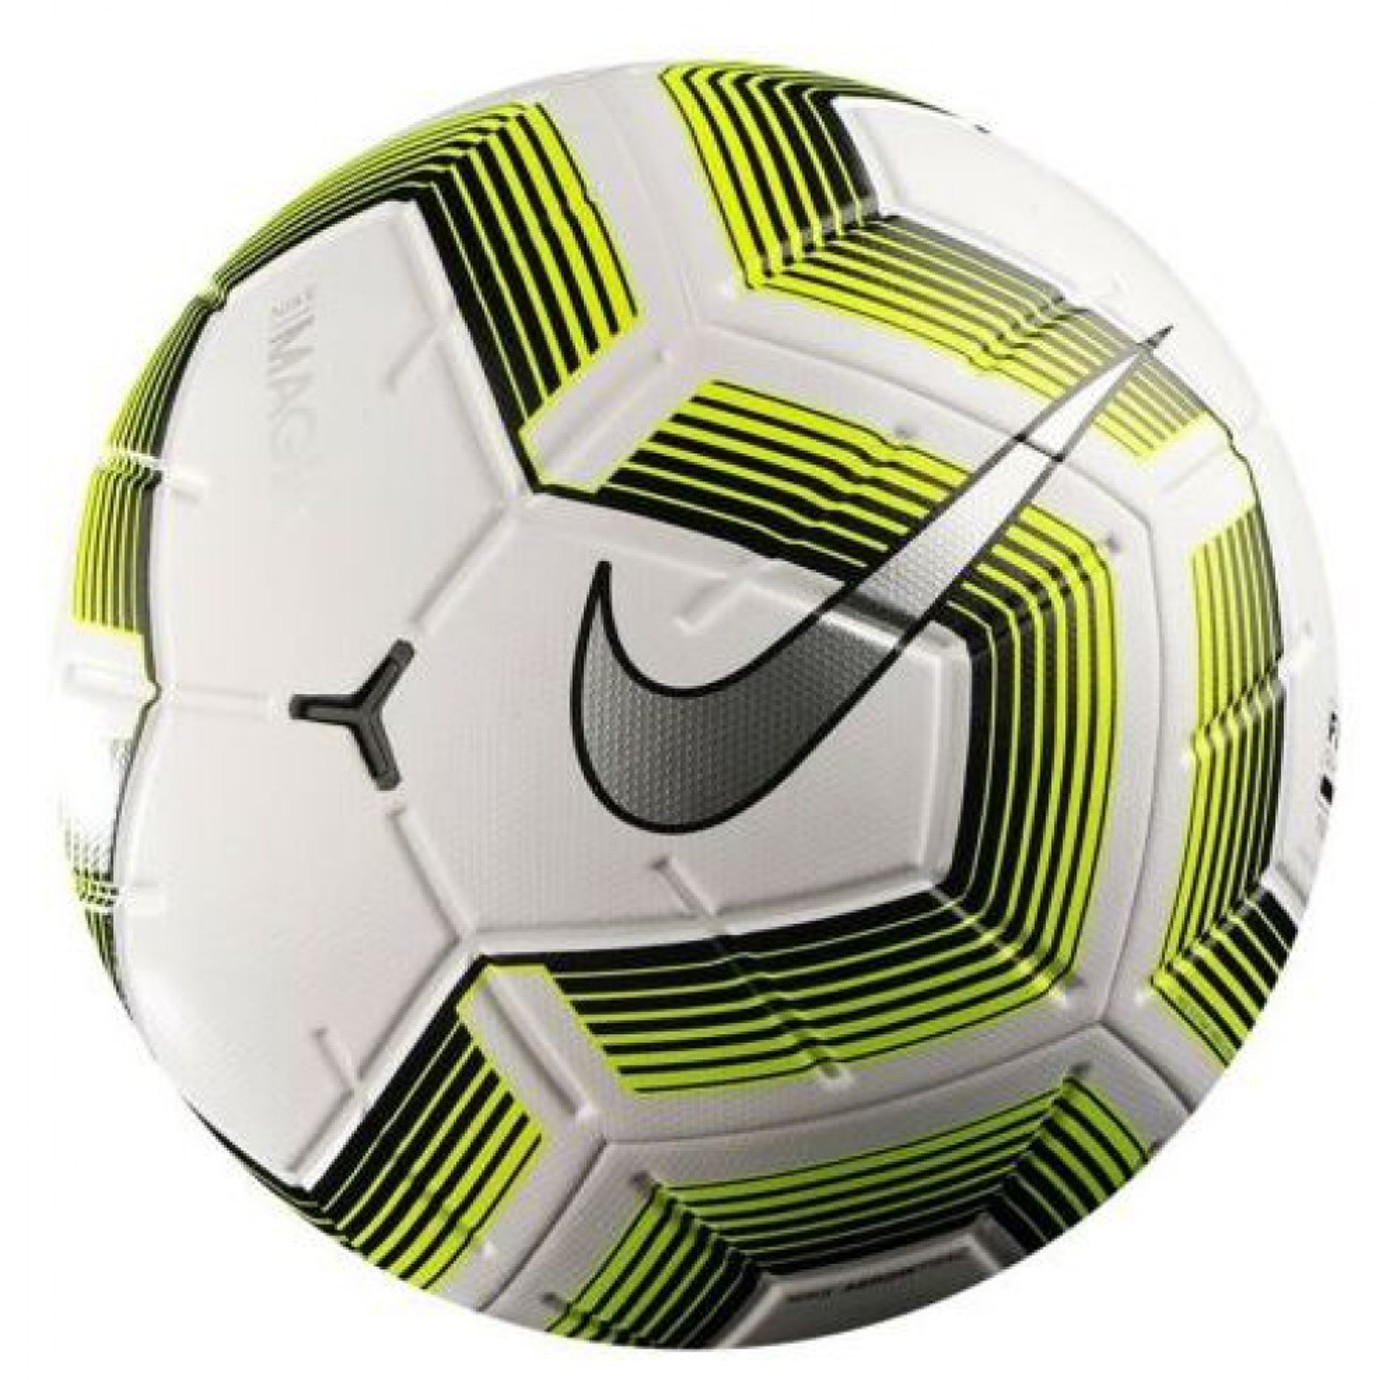 Nike Magia 2 Soccer Ball